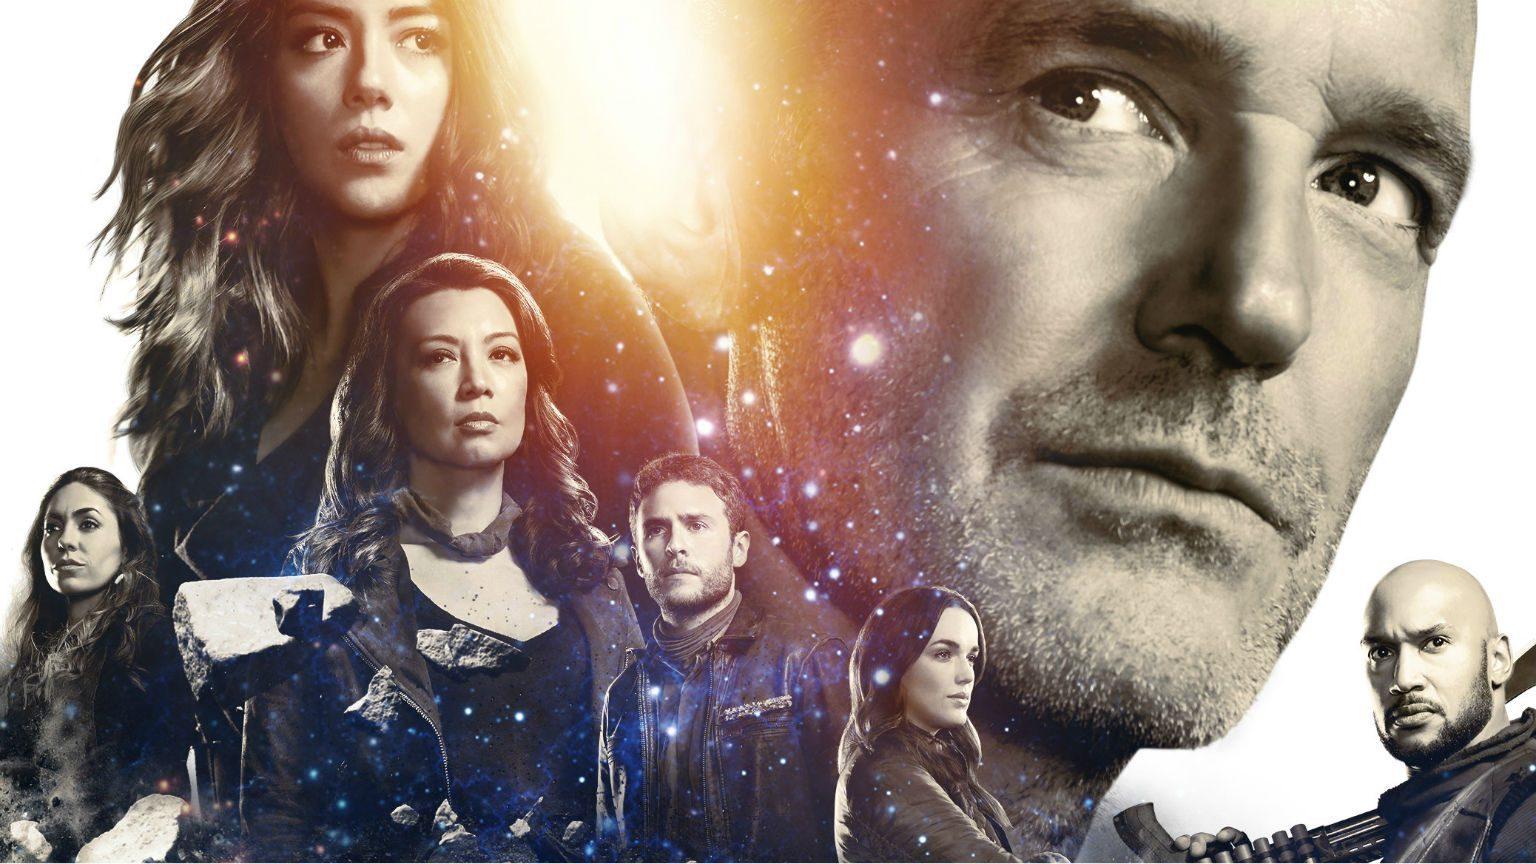 Agents of S.H.I.E.LD. promo image